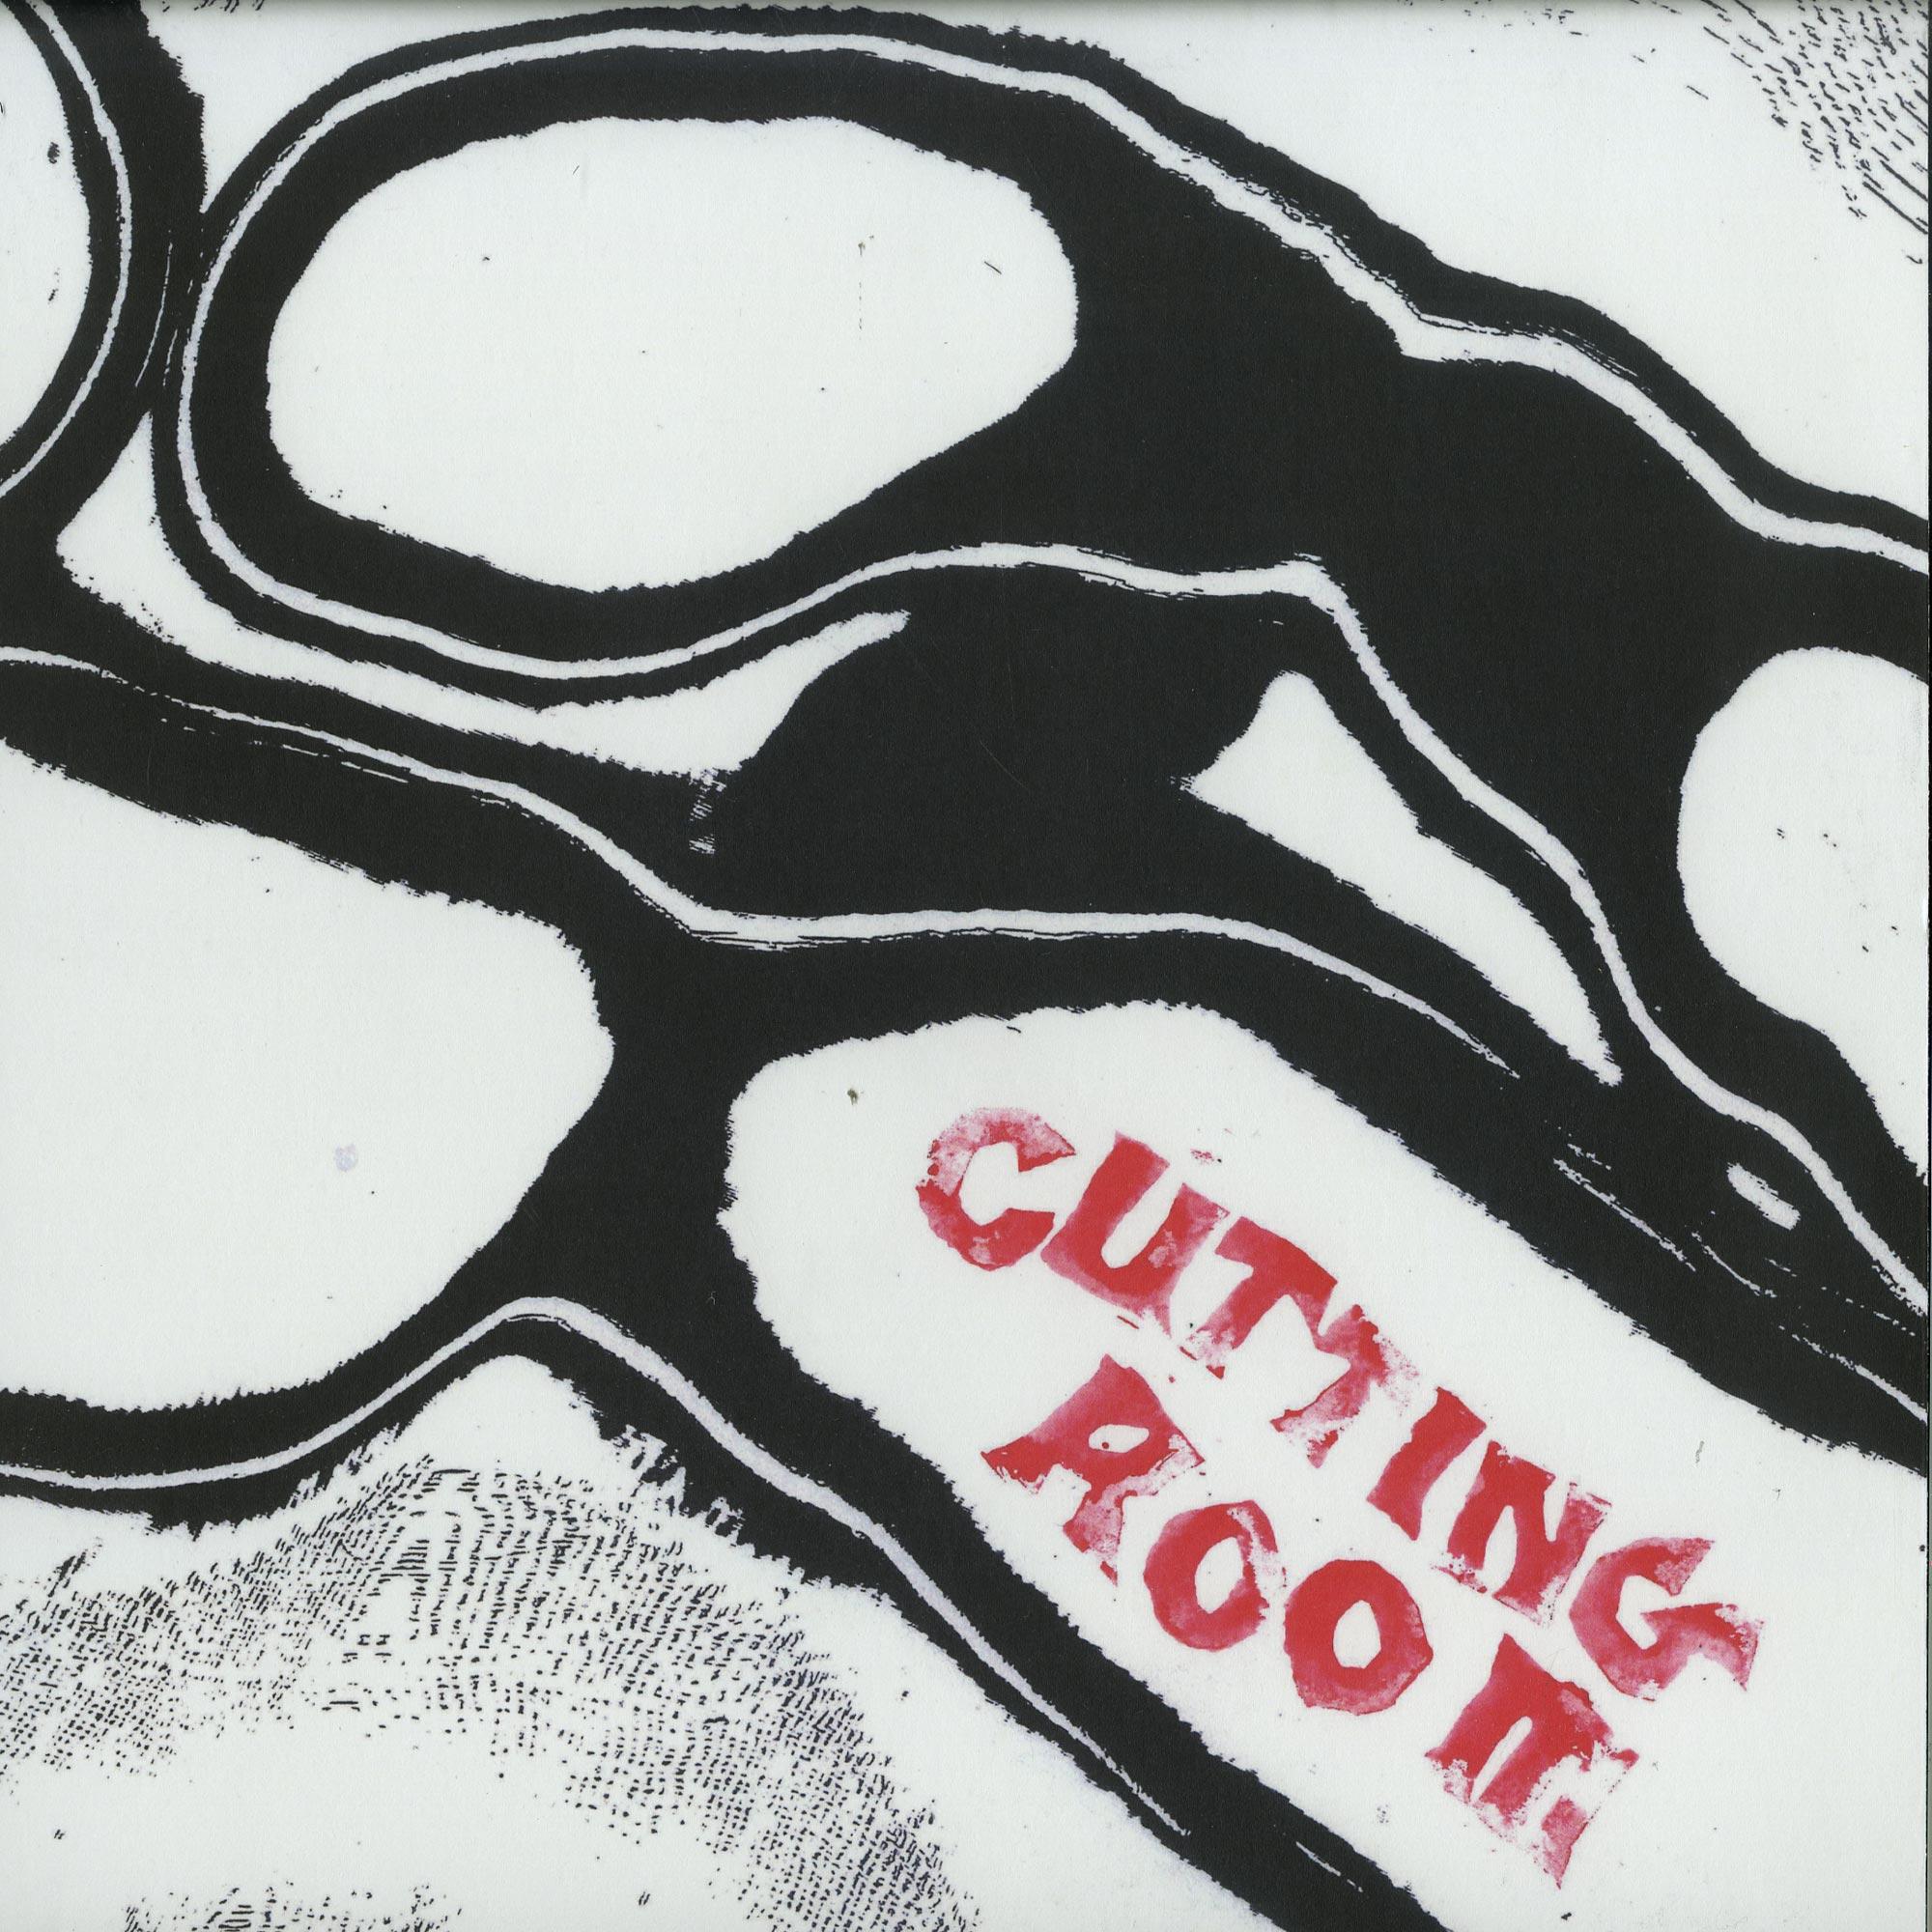 Cutting Room - STPLJCK002